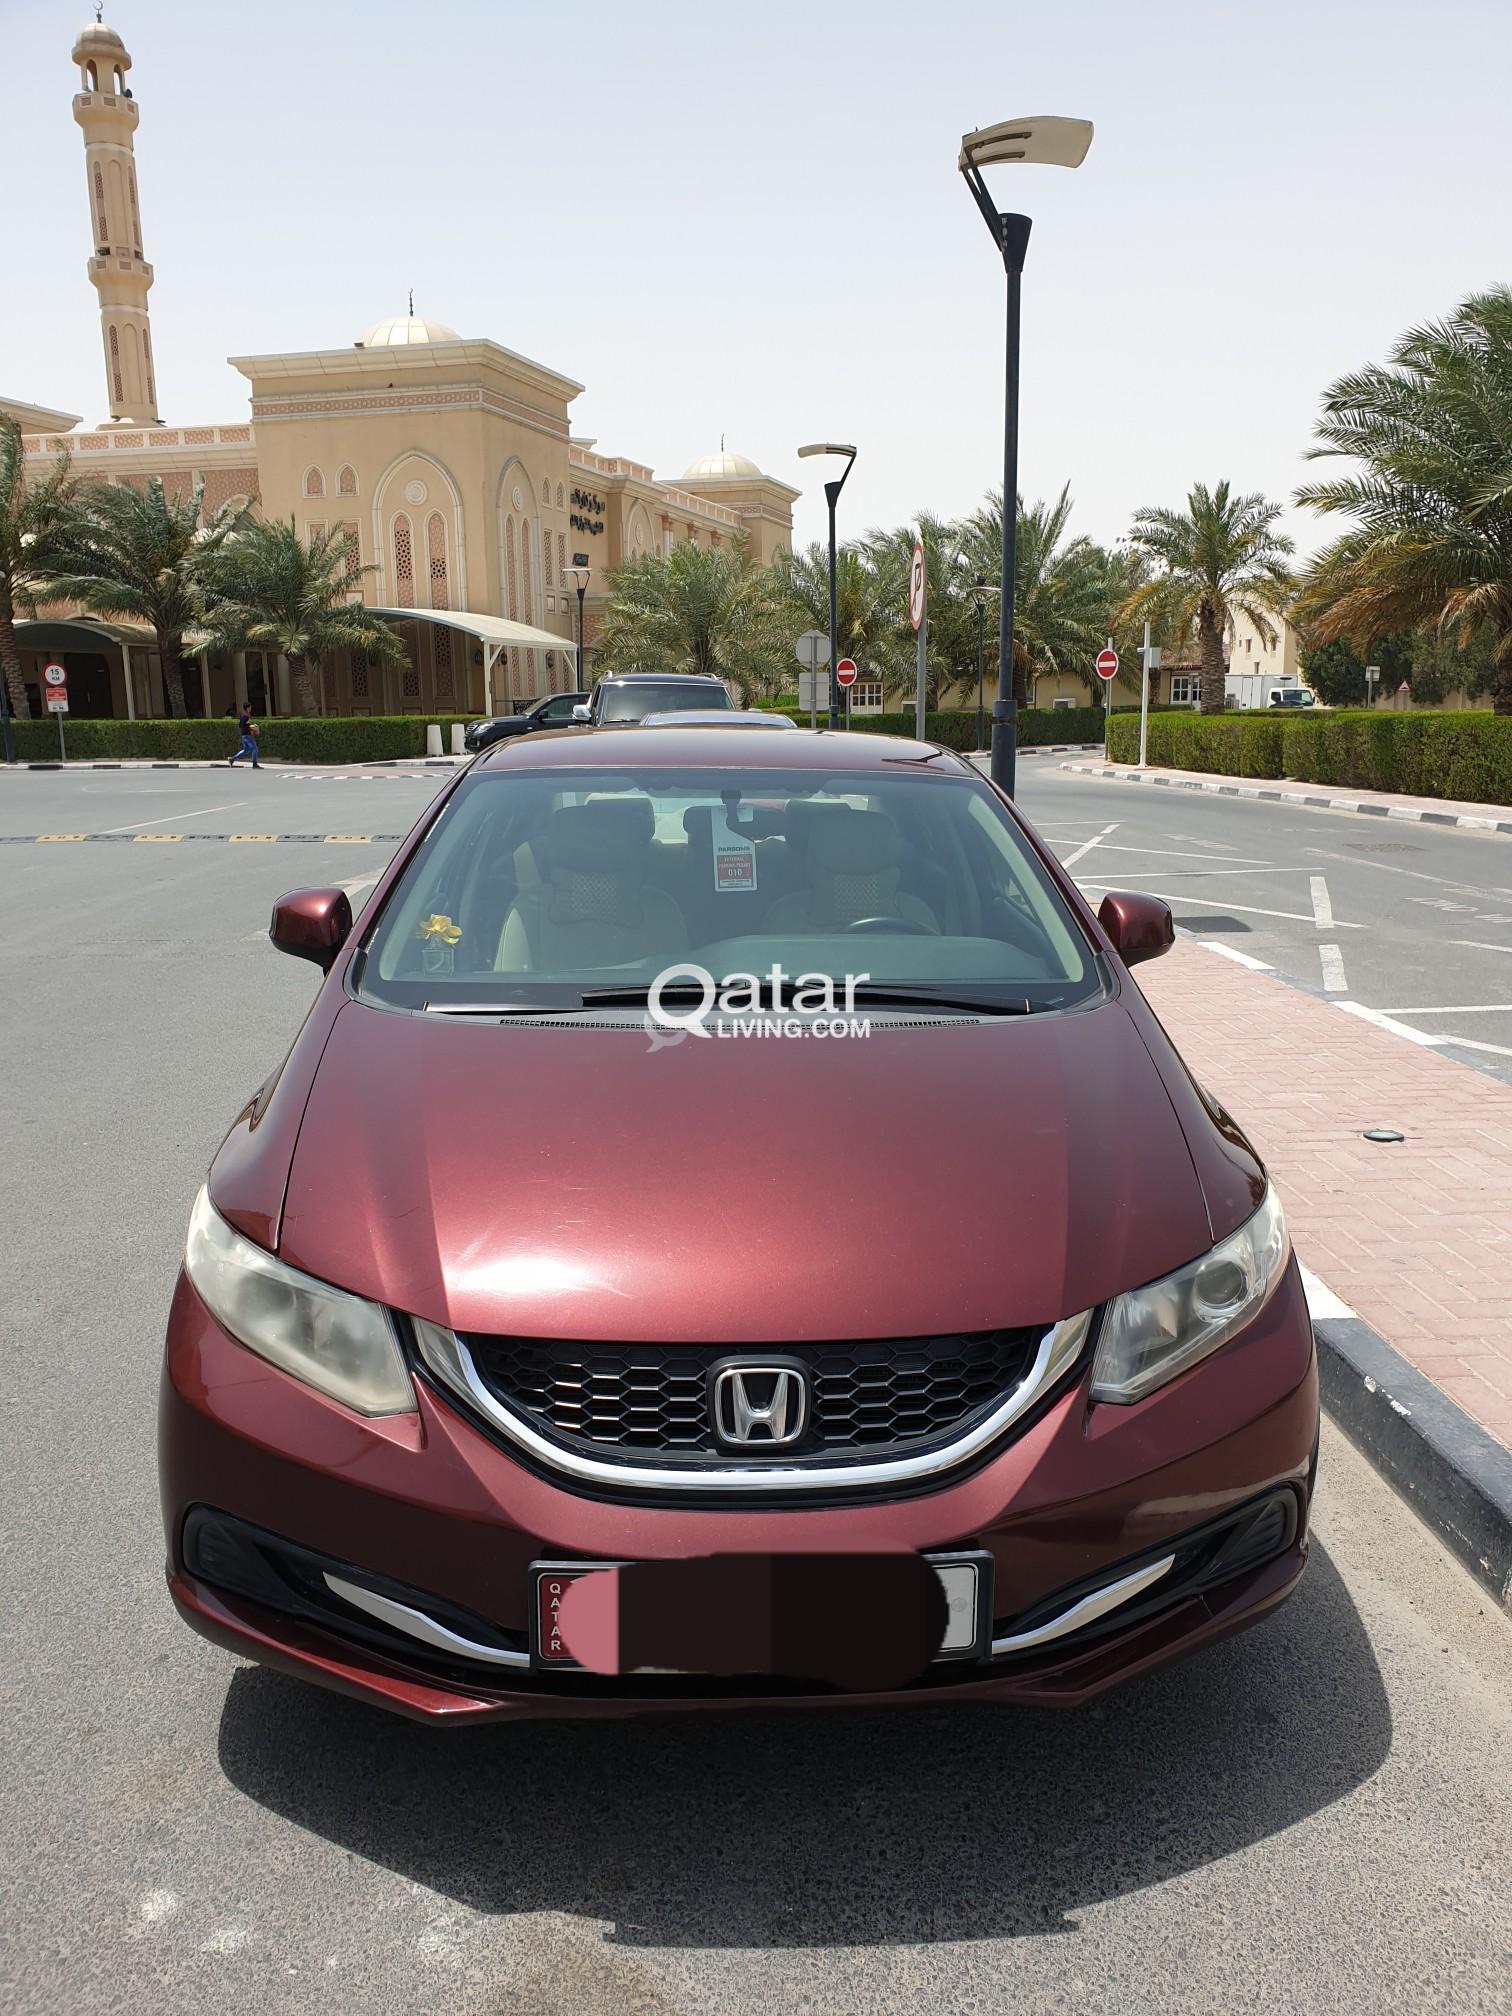 3f04681e8d73f2 New Istimara(Registration) Honda Civic 2013 in Excellent condition (Maroon  Color) Contact: 33271881 Call/Whatsapp | Qatar Living